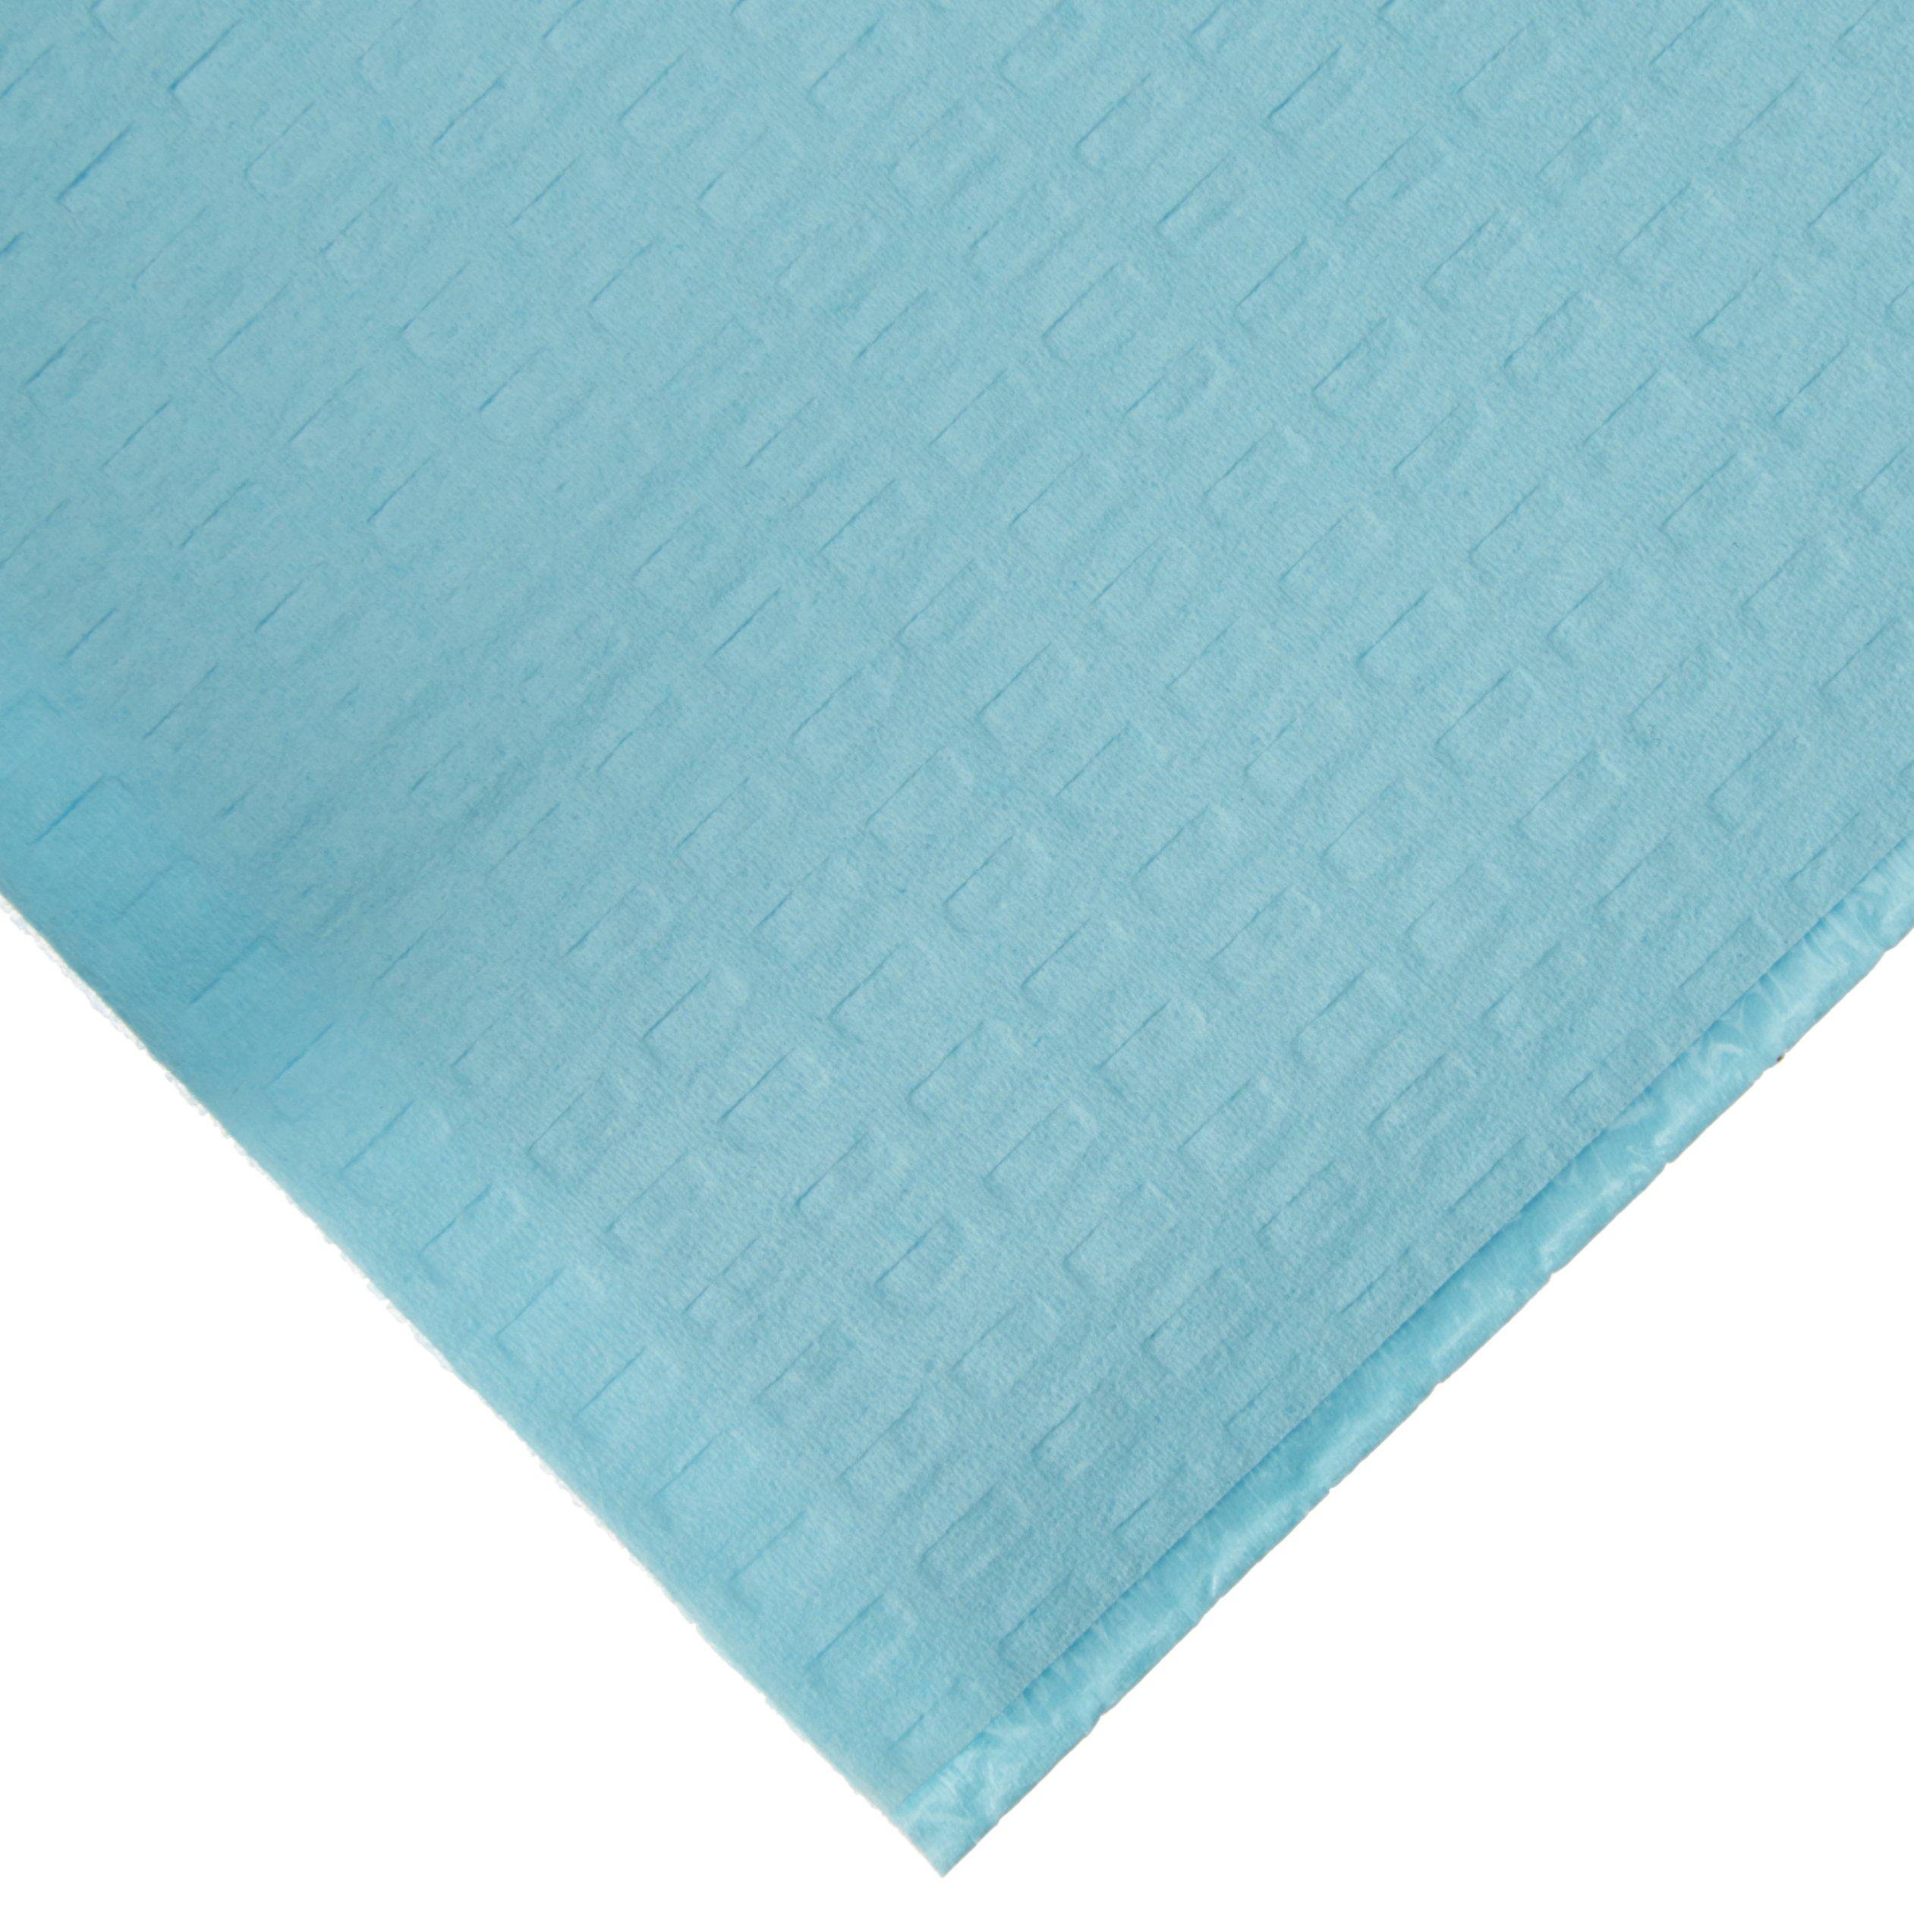 2ply Tissue/Poly Blue Dental Bib